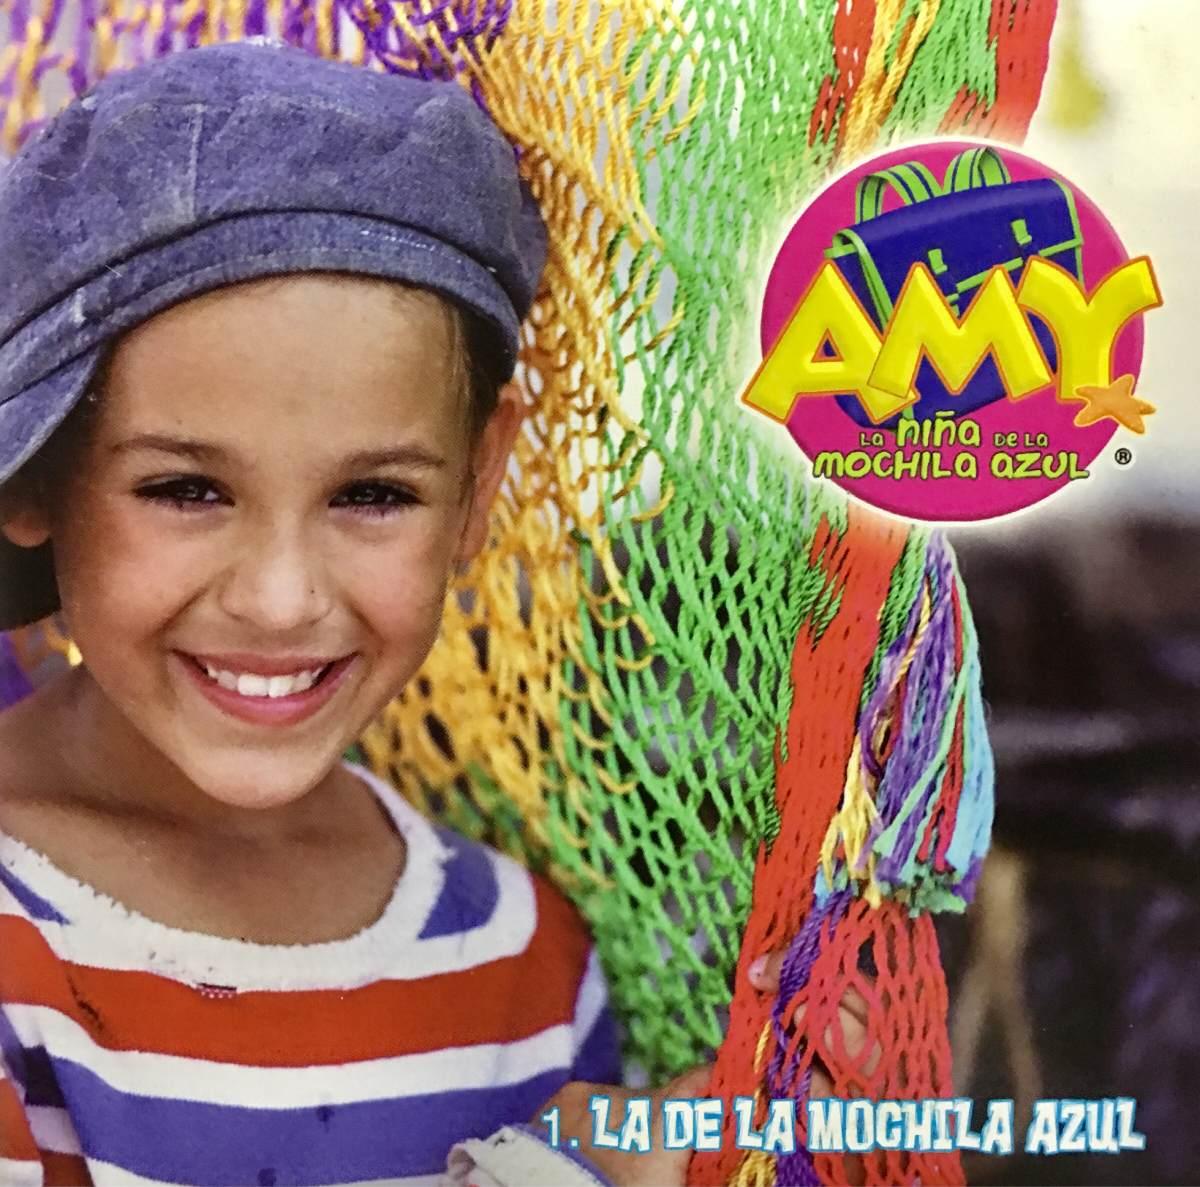 Amy A Mochila Azul cd amy la niña de la mochila azul promo usado - danna paola - $ 1,299.99